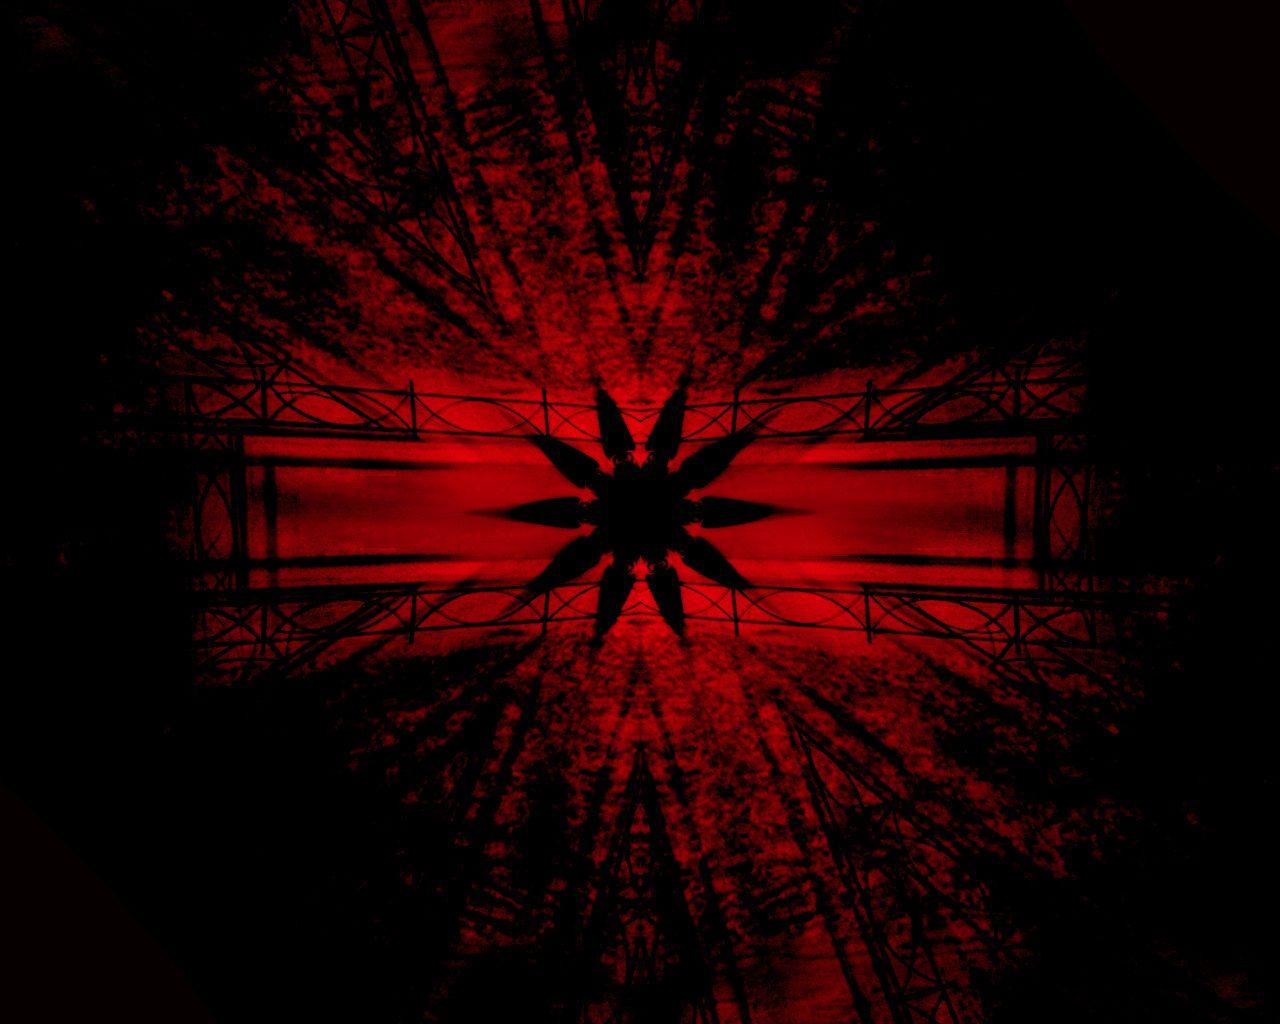 black star red design picture and wallpaper un toque de color pinterest red design black. Black Bedroom Furniture Sets. Home Design Ideas